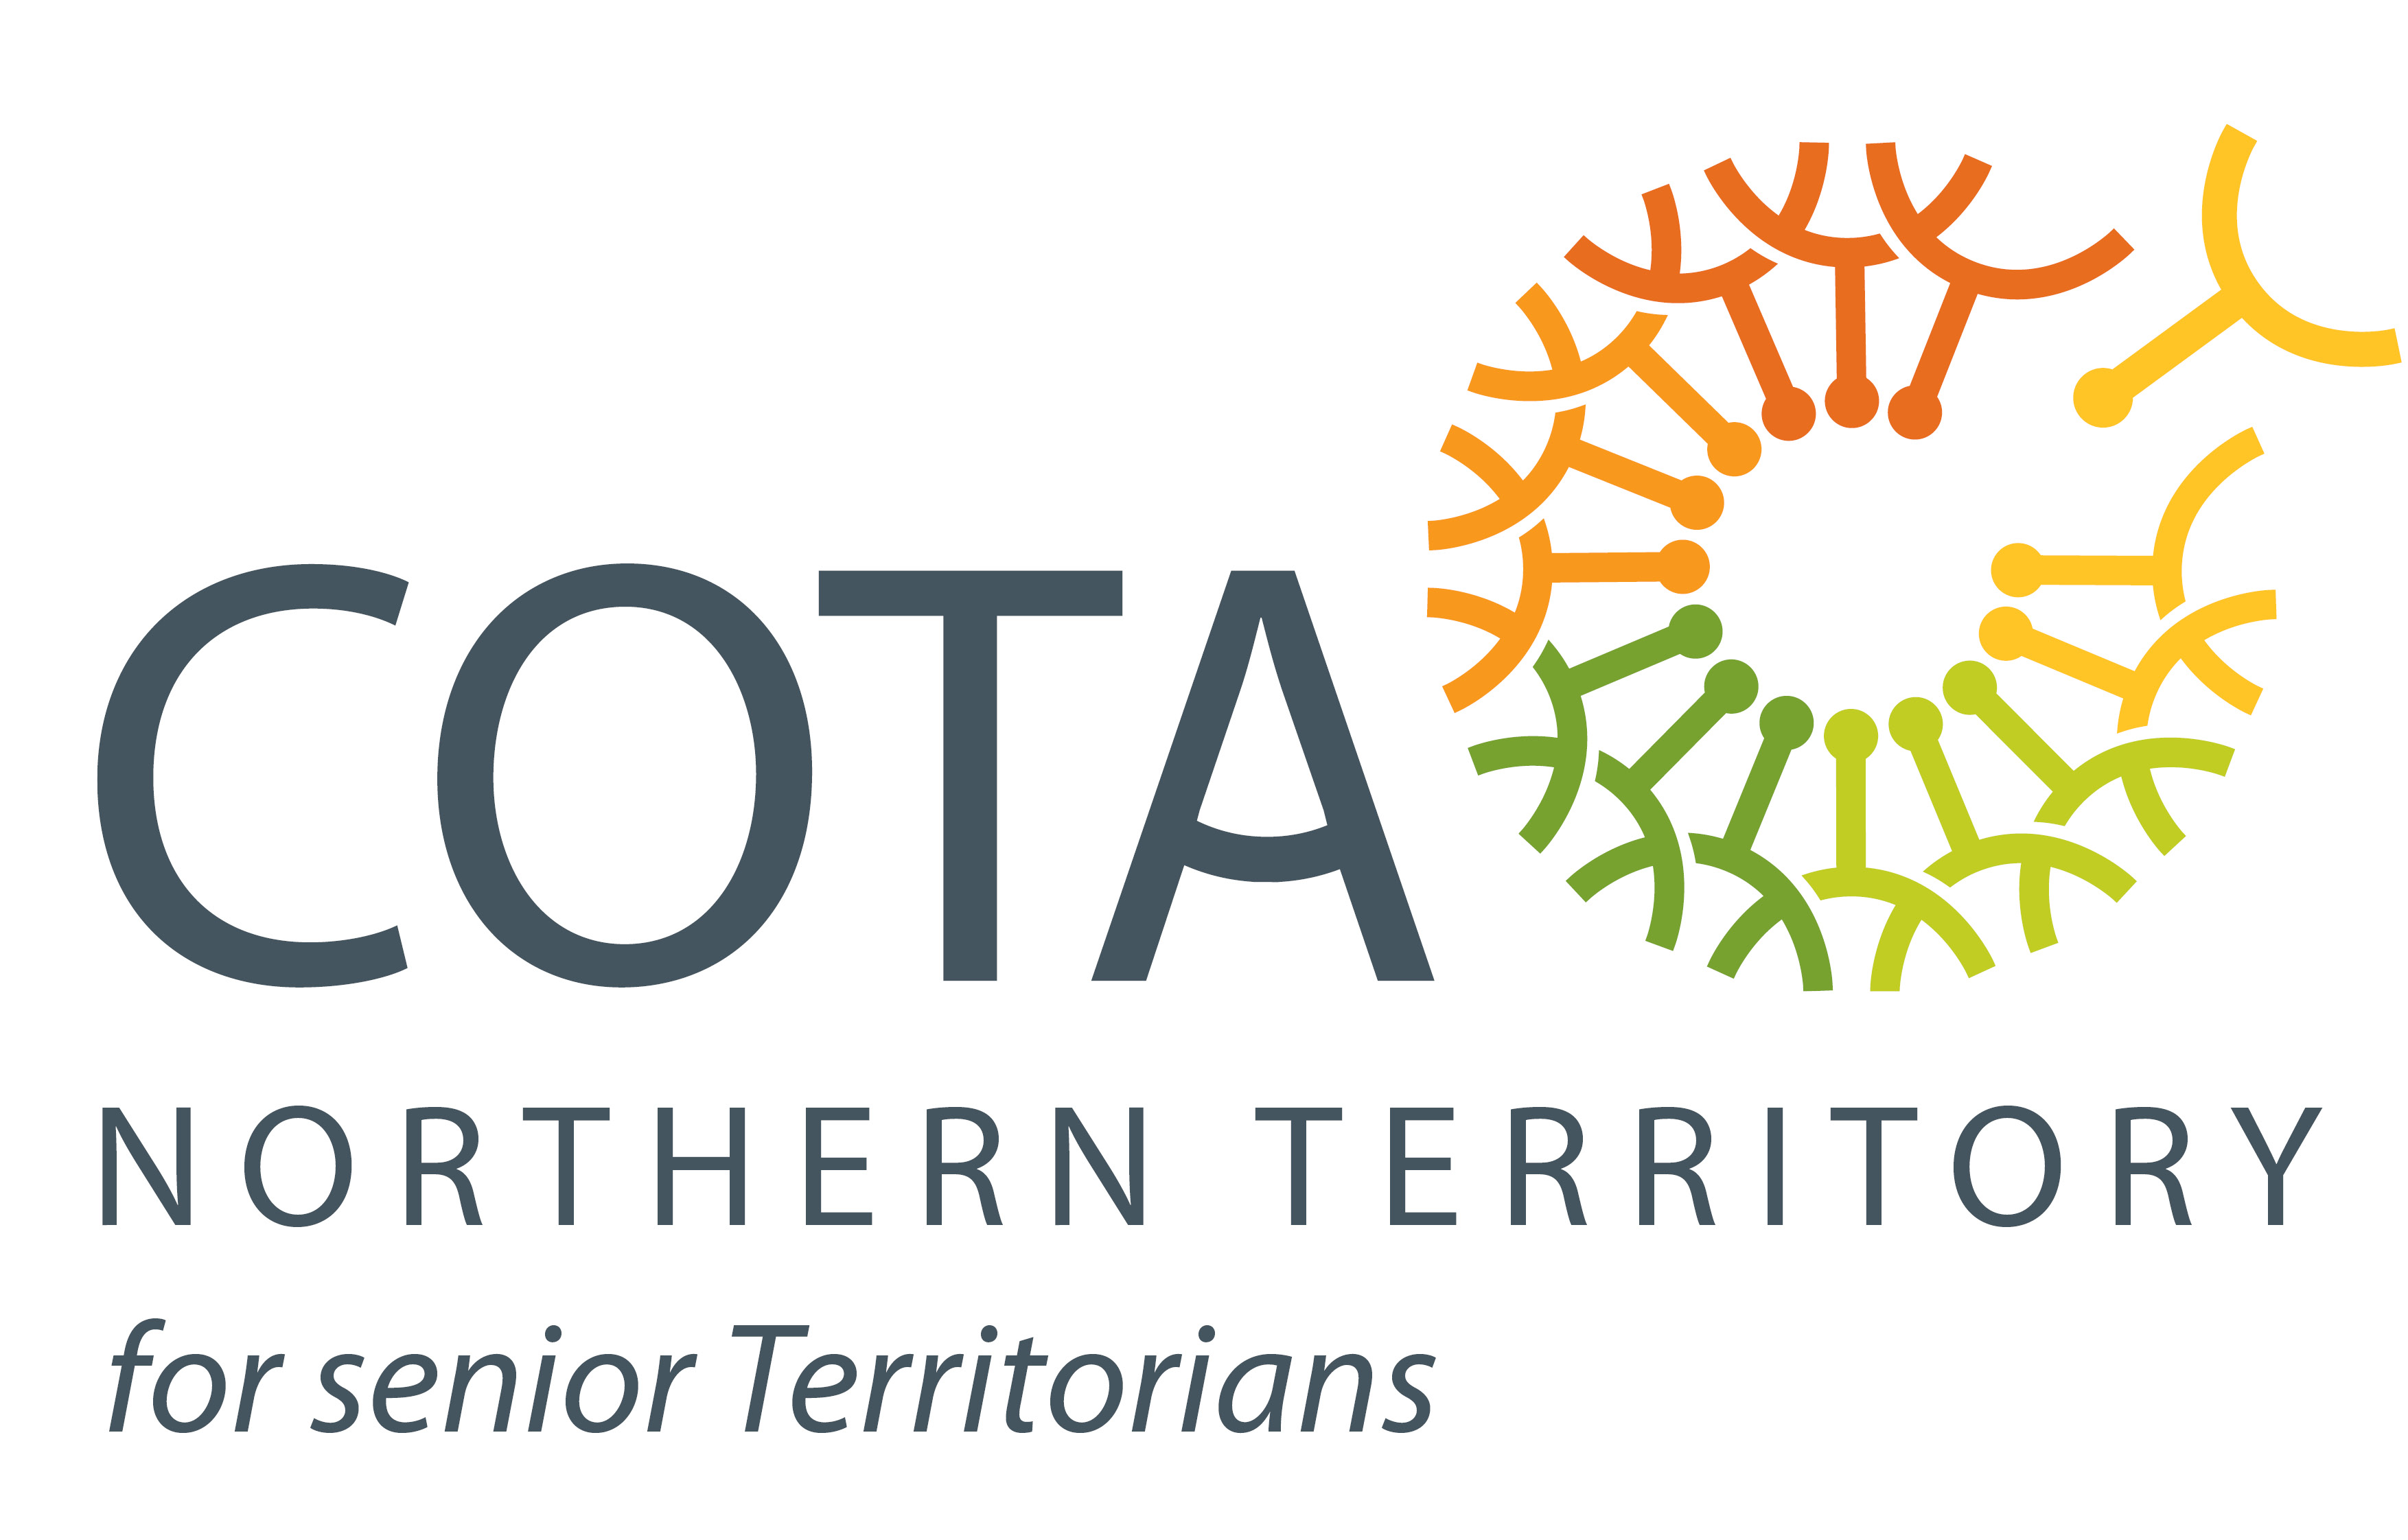 COTA_Northern_Territory_for_seniors_Territorians_logo_png.png